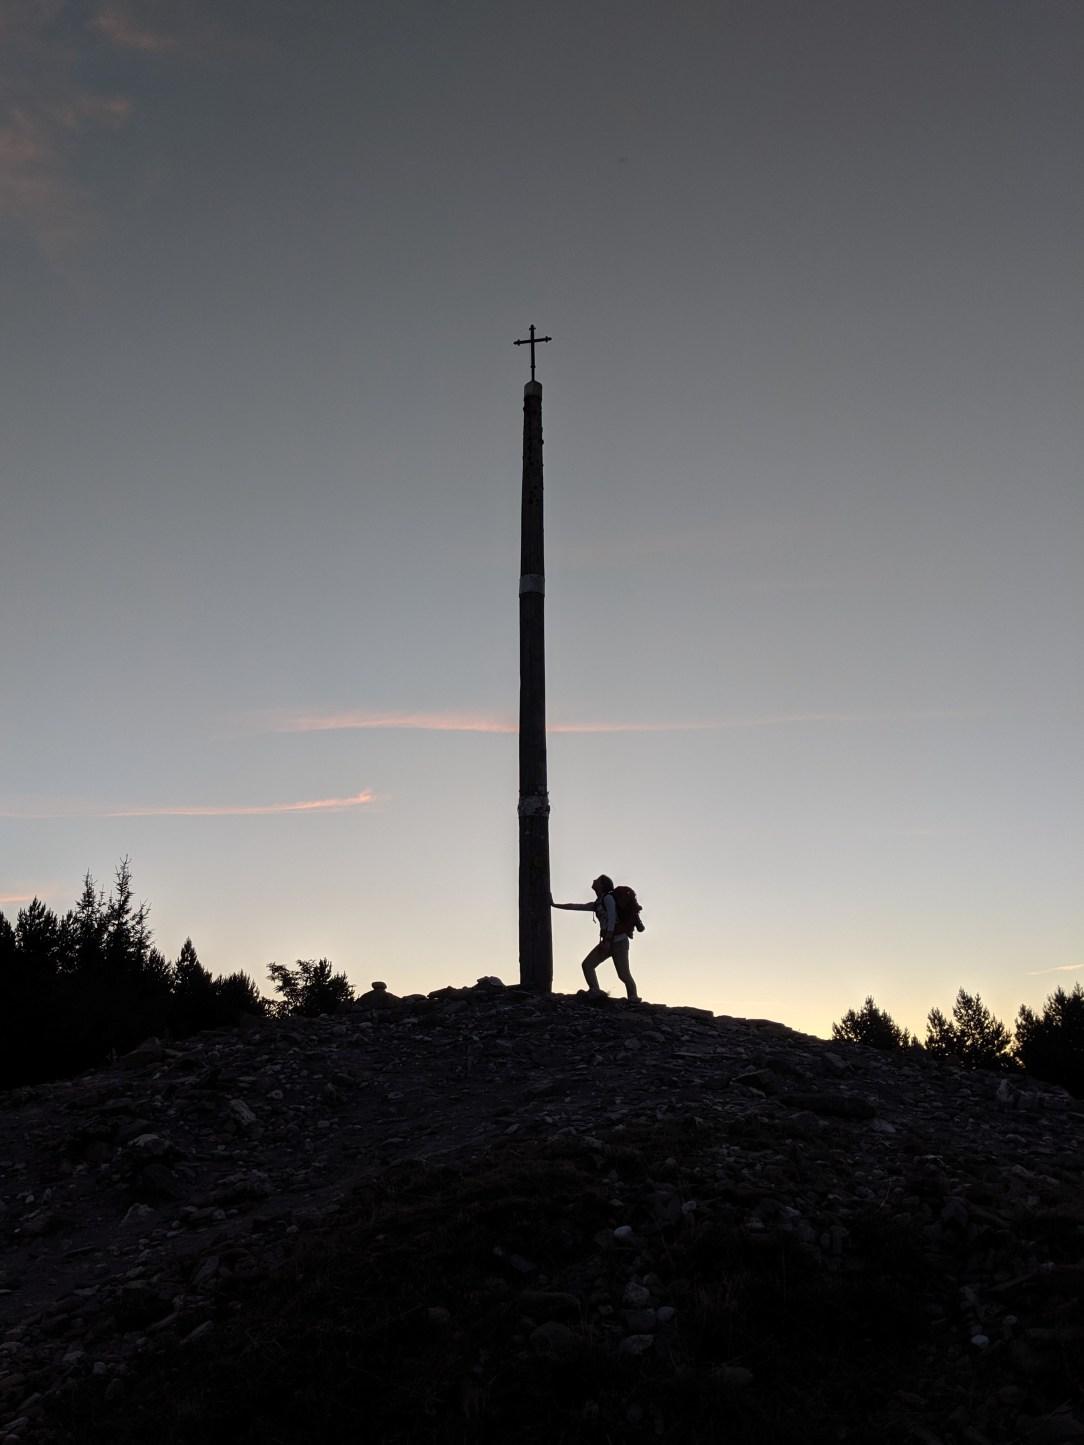 Cruz de Fero, pilgrim, Camino de Santiago